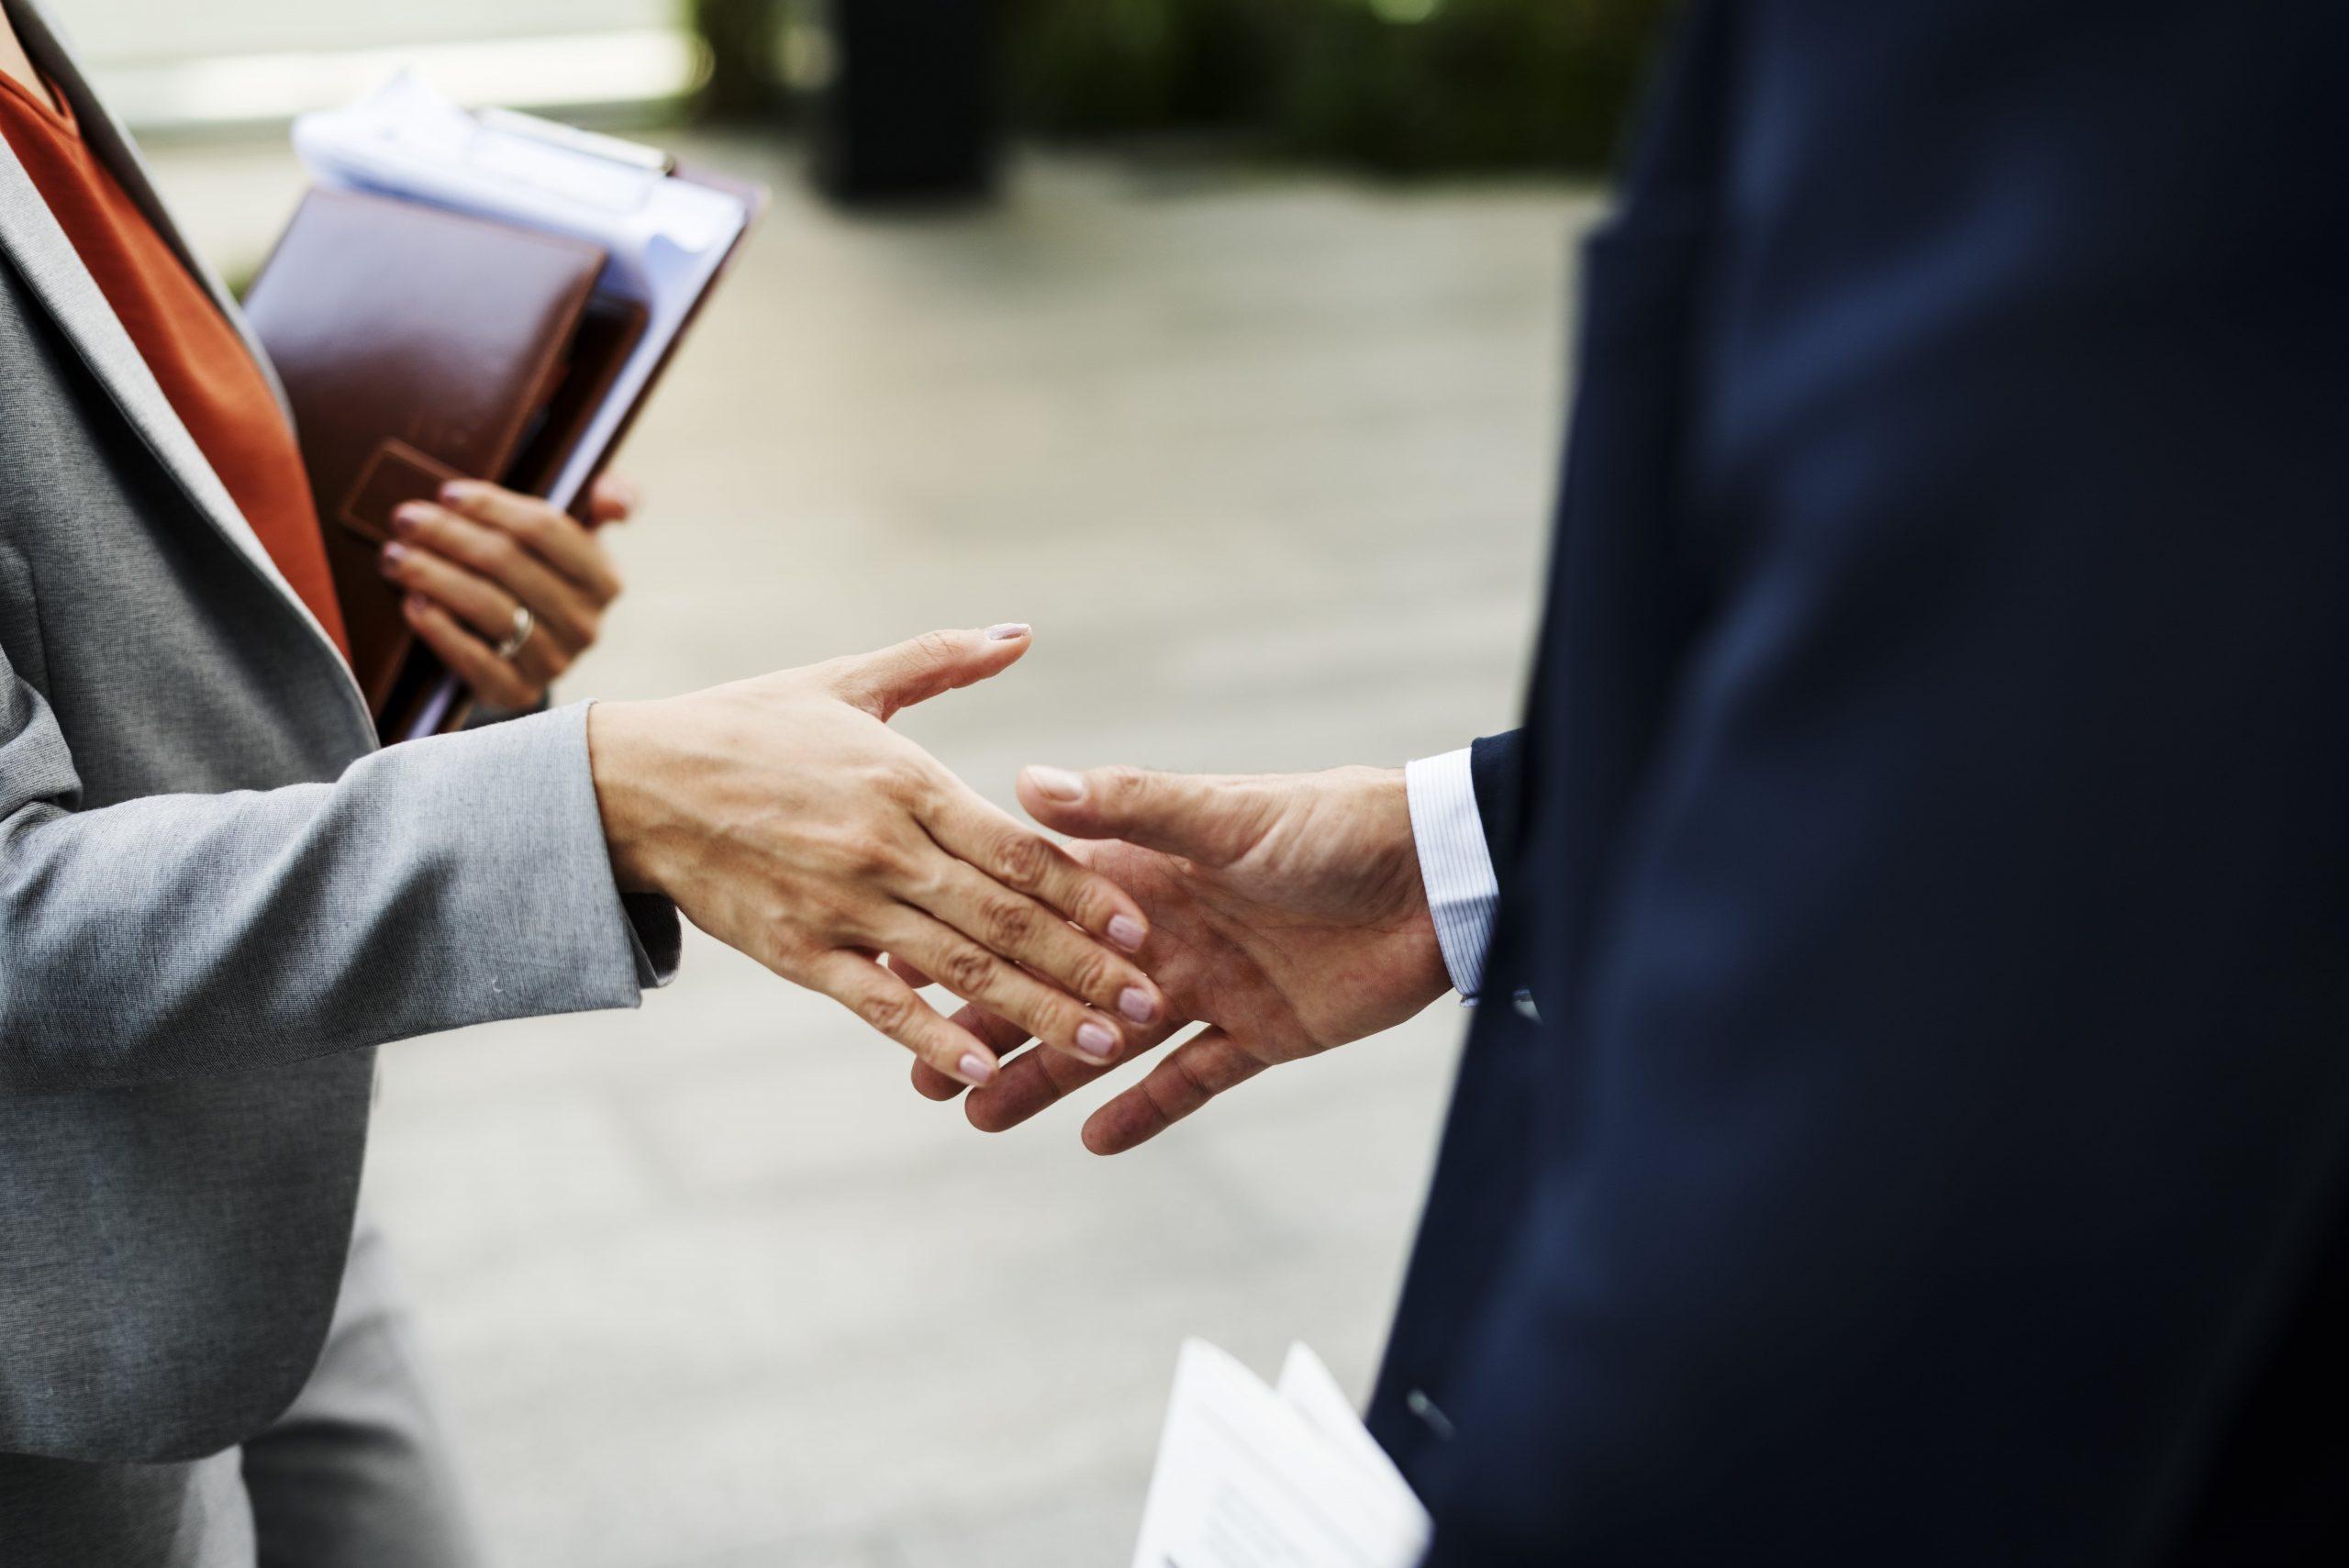 handshake-corporate-partnership-office-worker-conc-P6MG24W